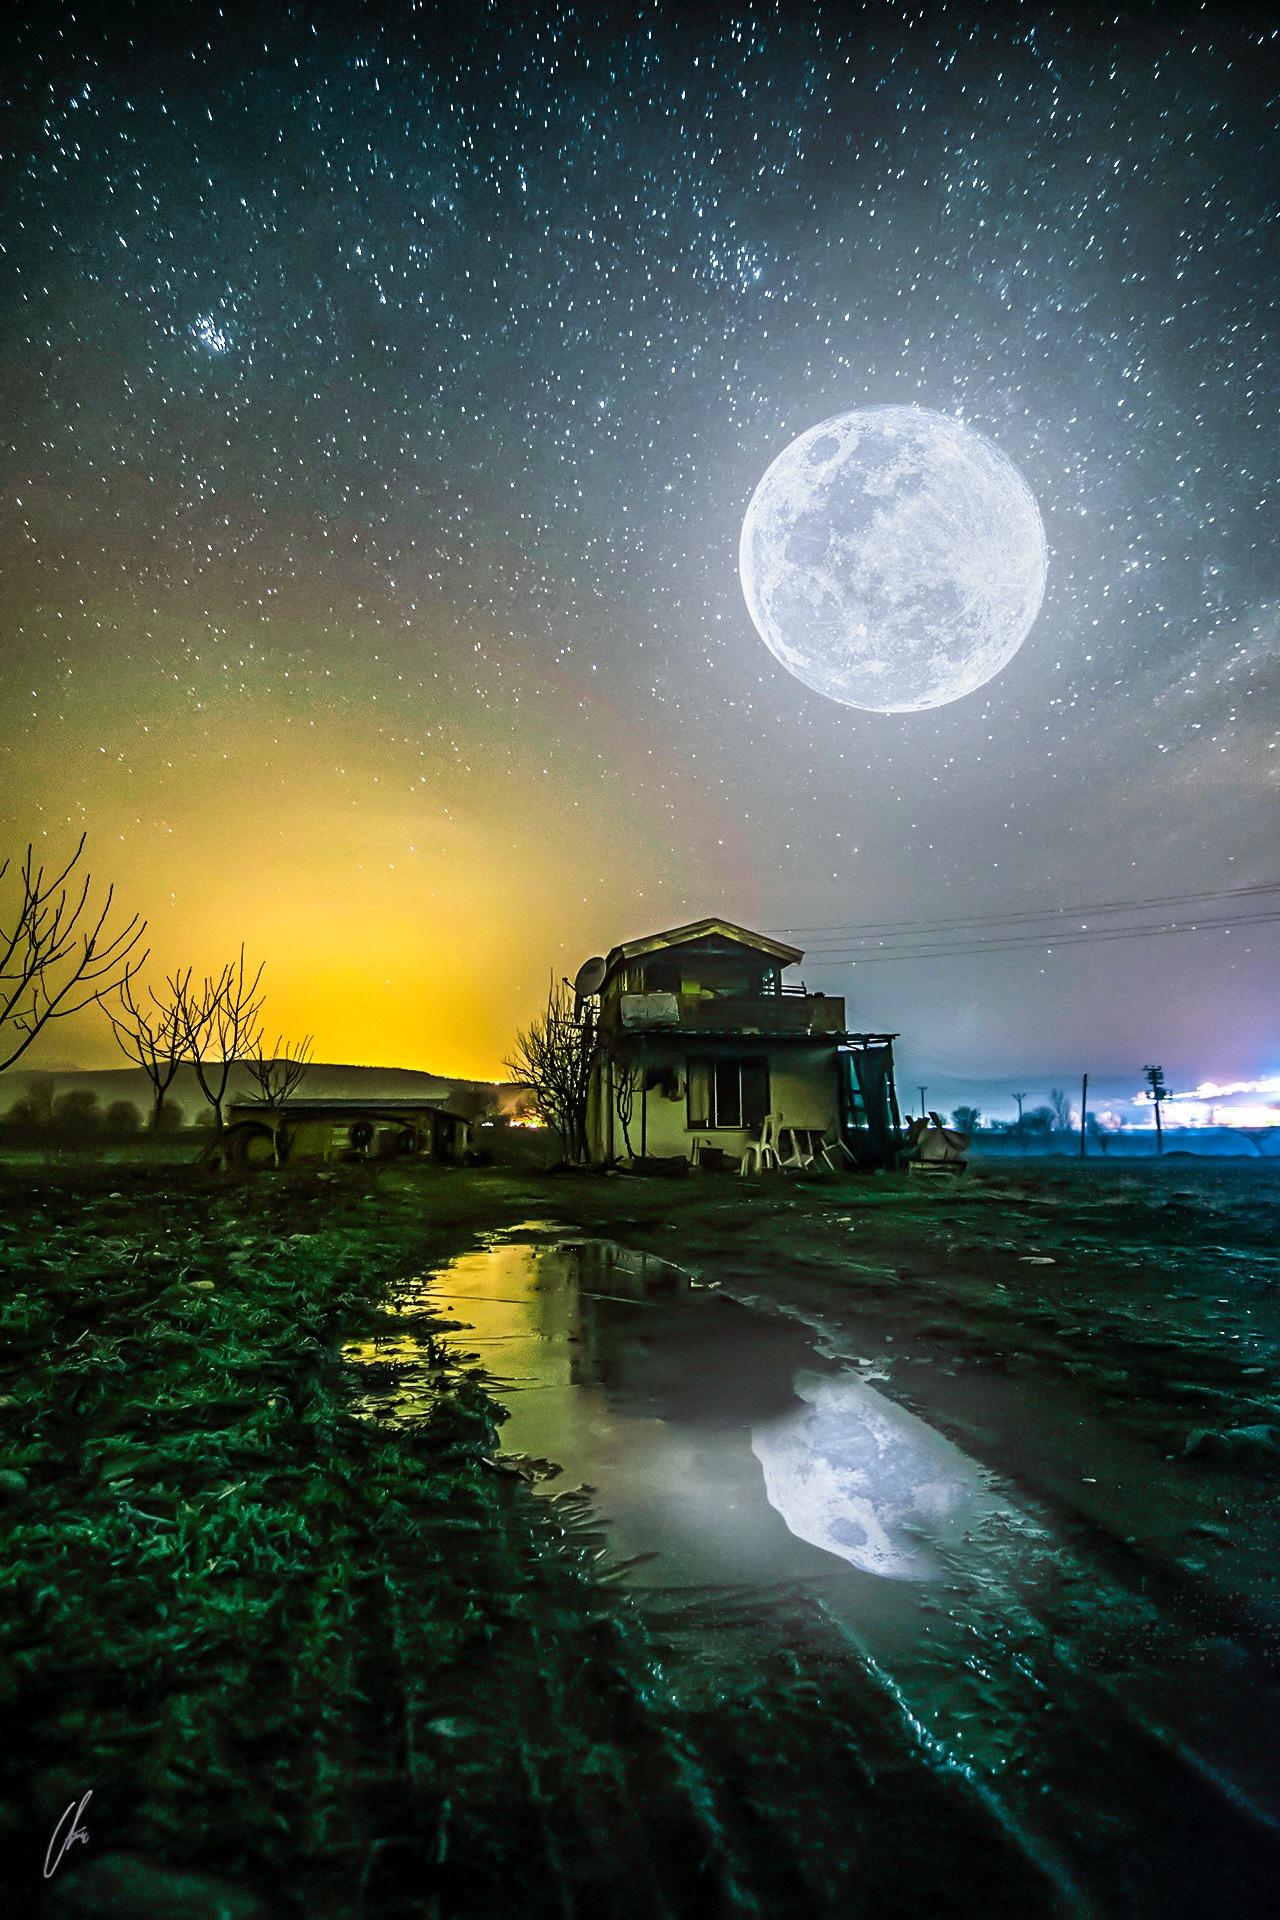 moon and hause by ufuk.salur